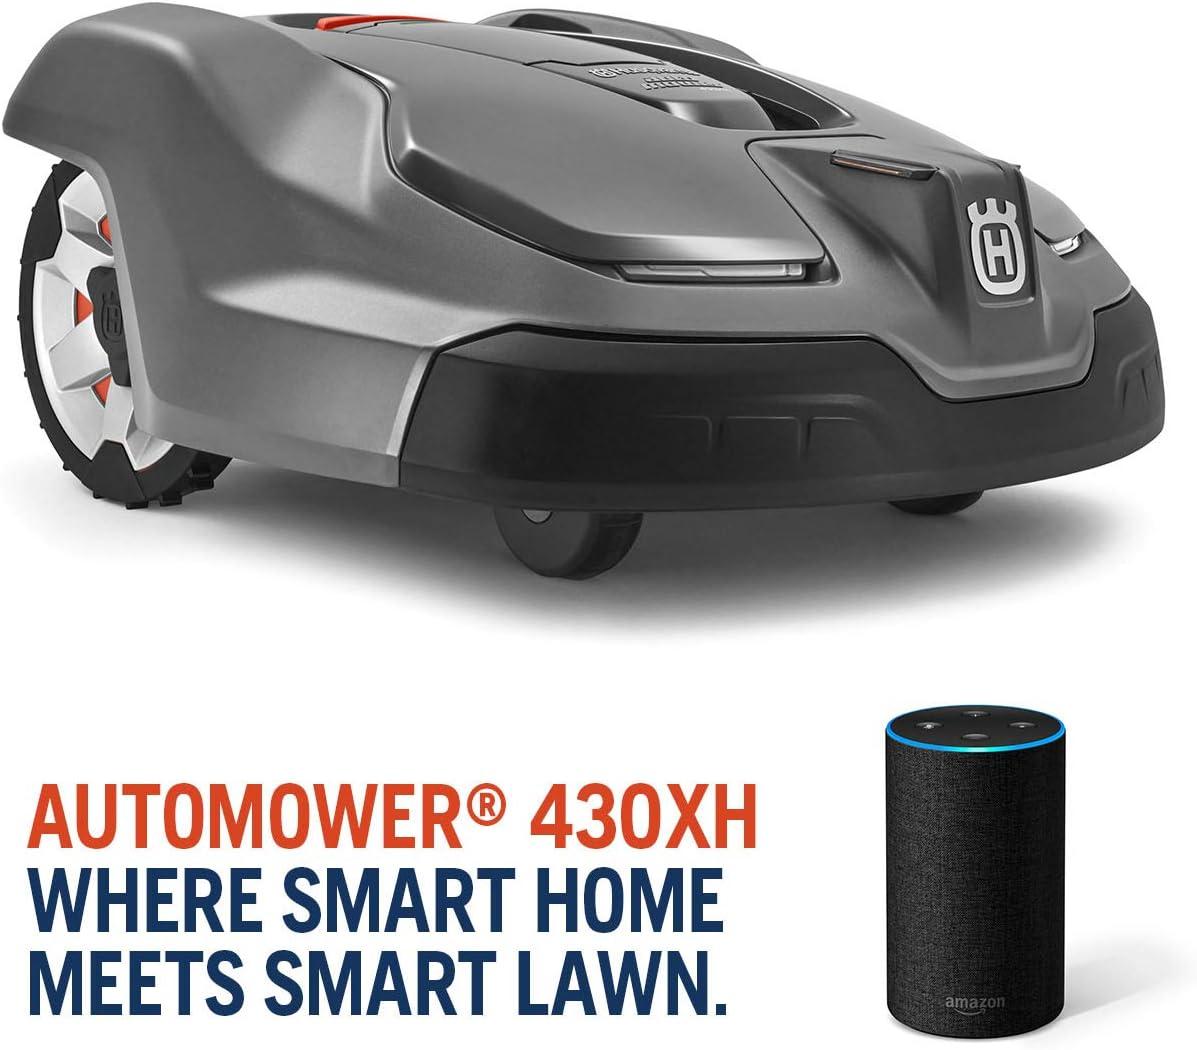 Husqvarna 430XH Robotic Mowers, Orange/Gray